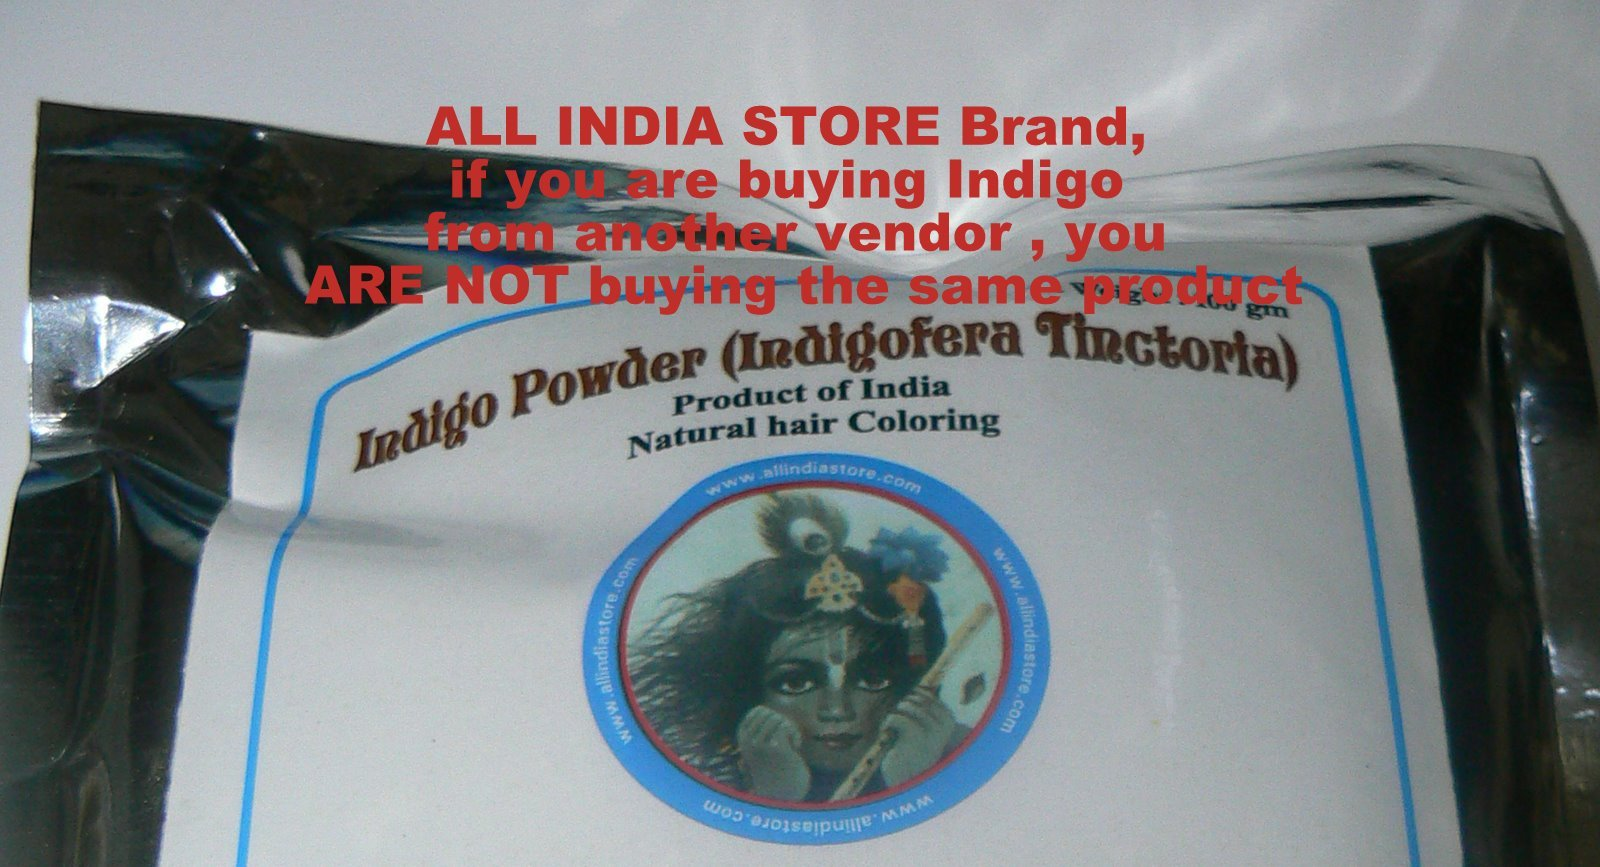 Indigo Powder 400 grams ALL INDIA STORE BRAND Indigofera Tinctoria (wasma in Arabic and Urdu) Product of India by All India Store